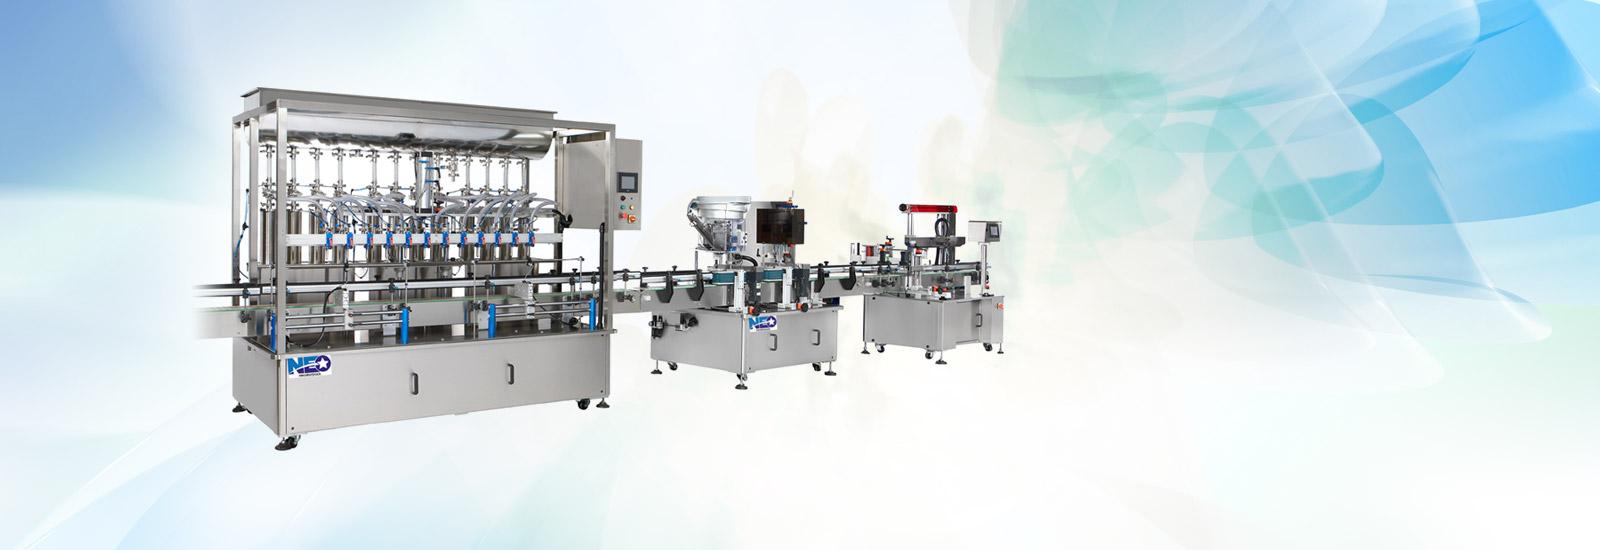 Mesin Pengemasan: Pabrikan Garis Pengisi Capper